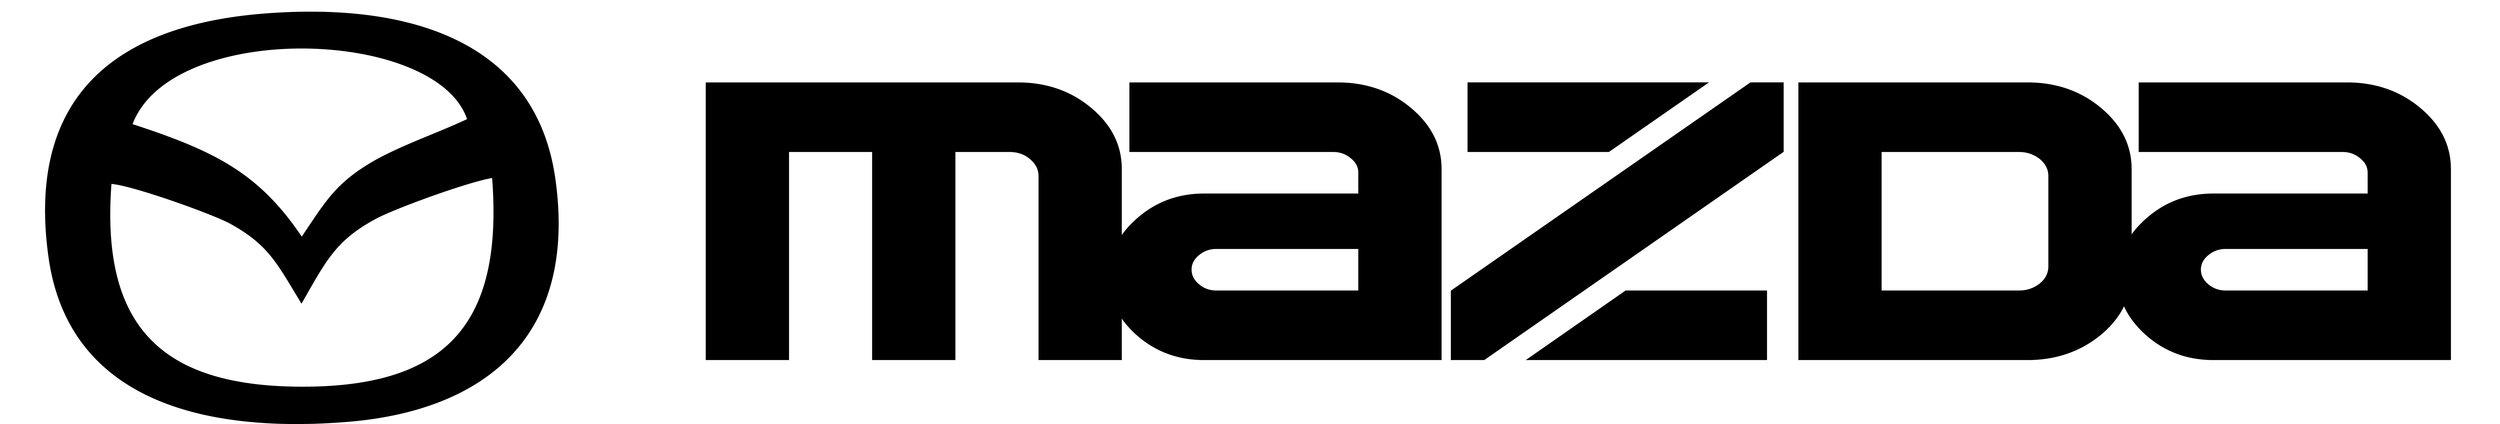 Kramer-mazda---Platinum-sponsor.jpg